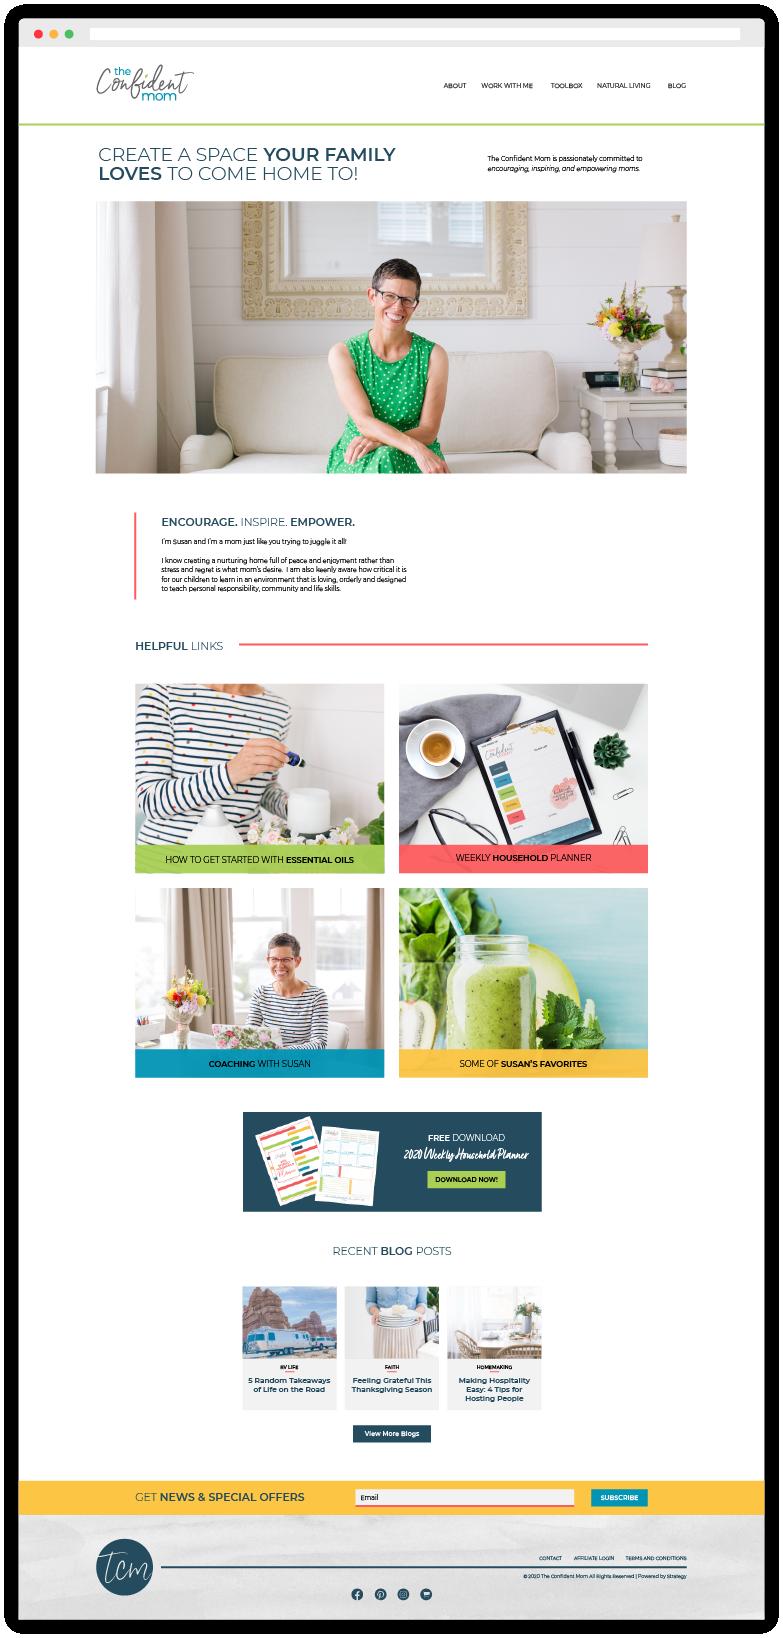 The Confident Mom Website Branding Design